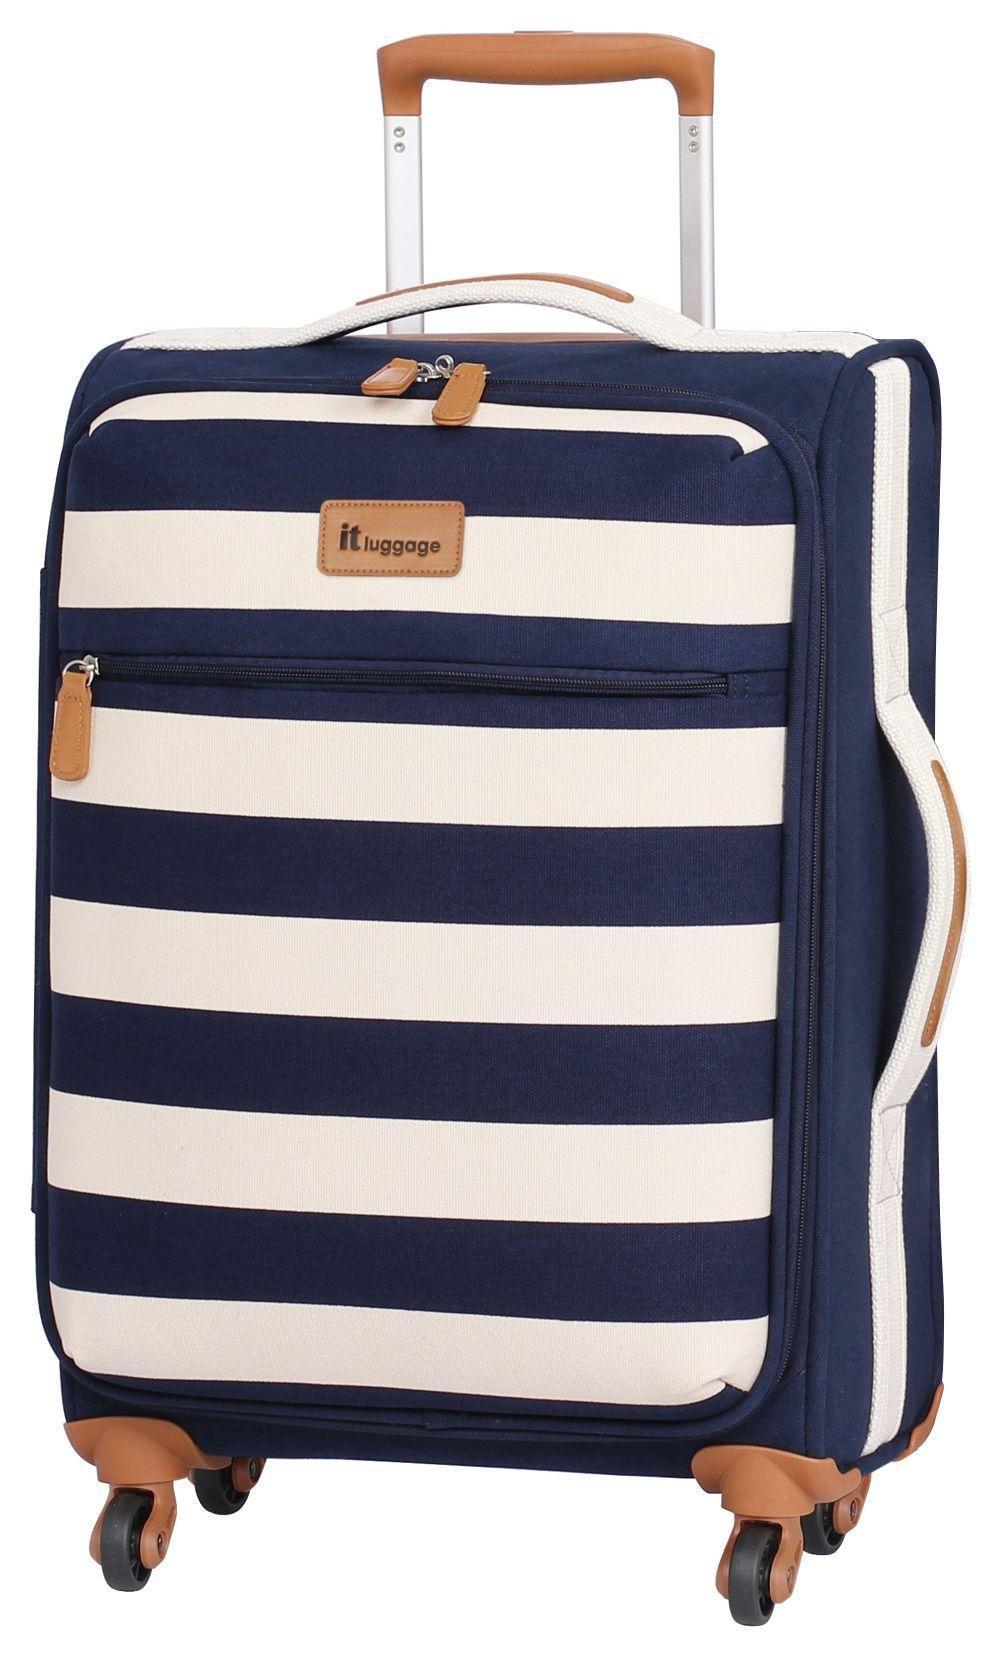 Buy IT Luggage Lightweight Large 4 Wheel Suitcase - Nautical at ...